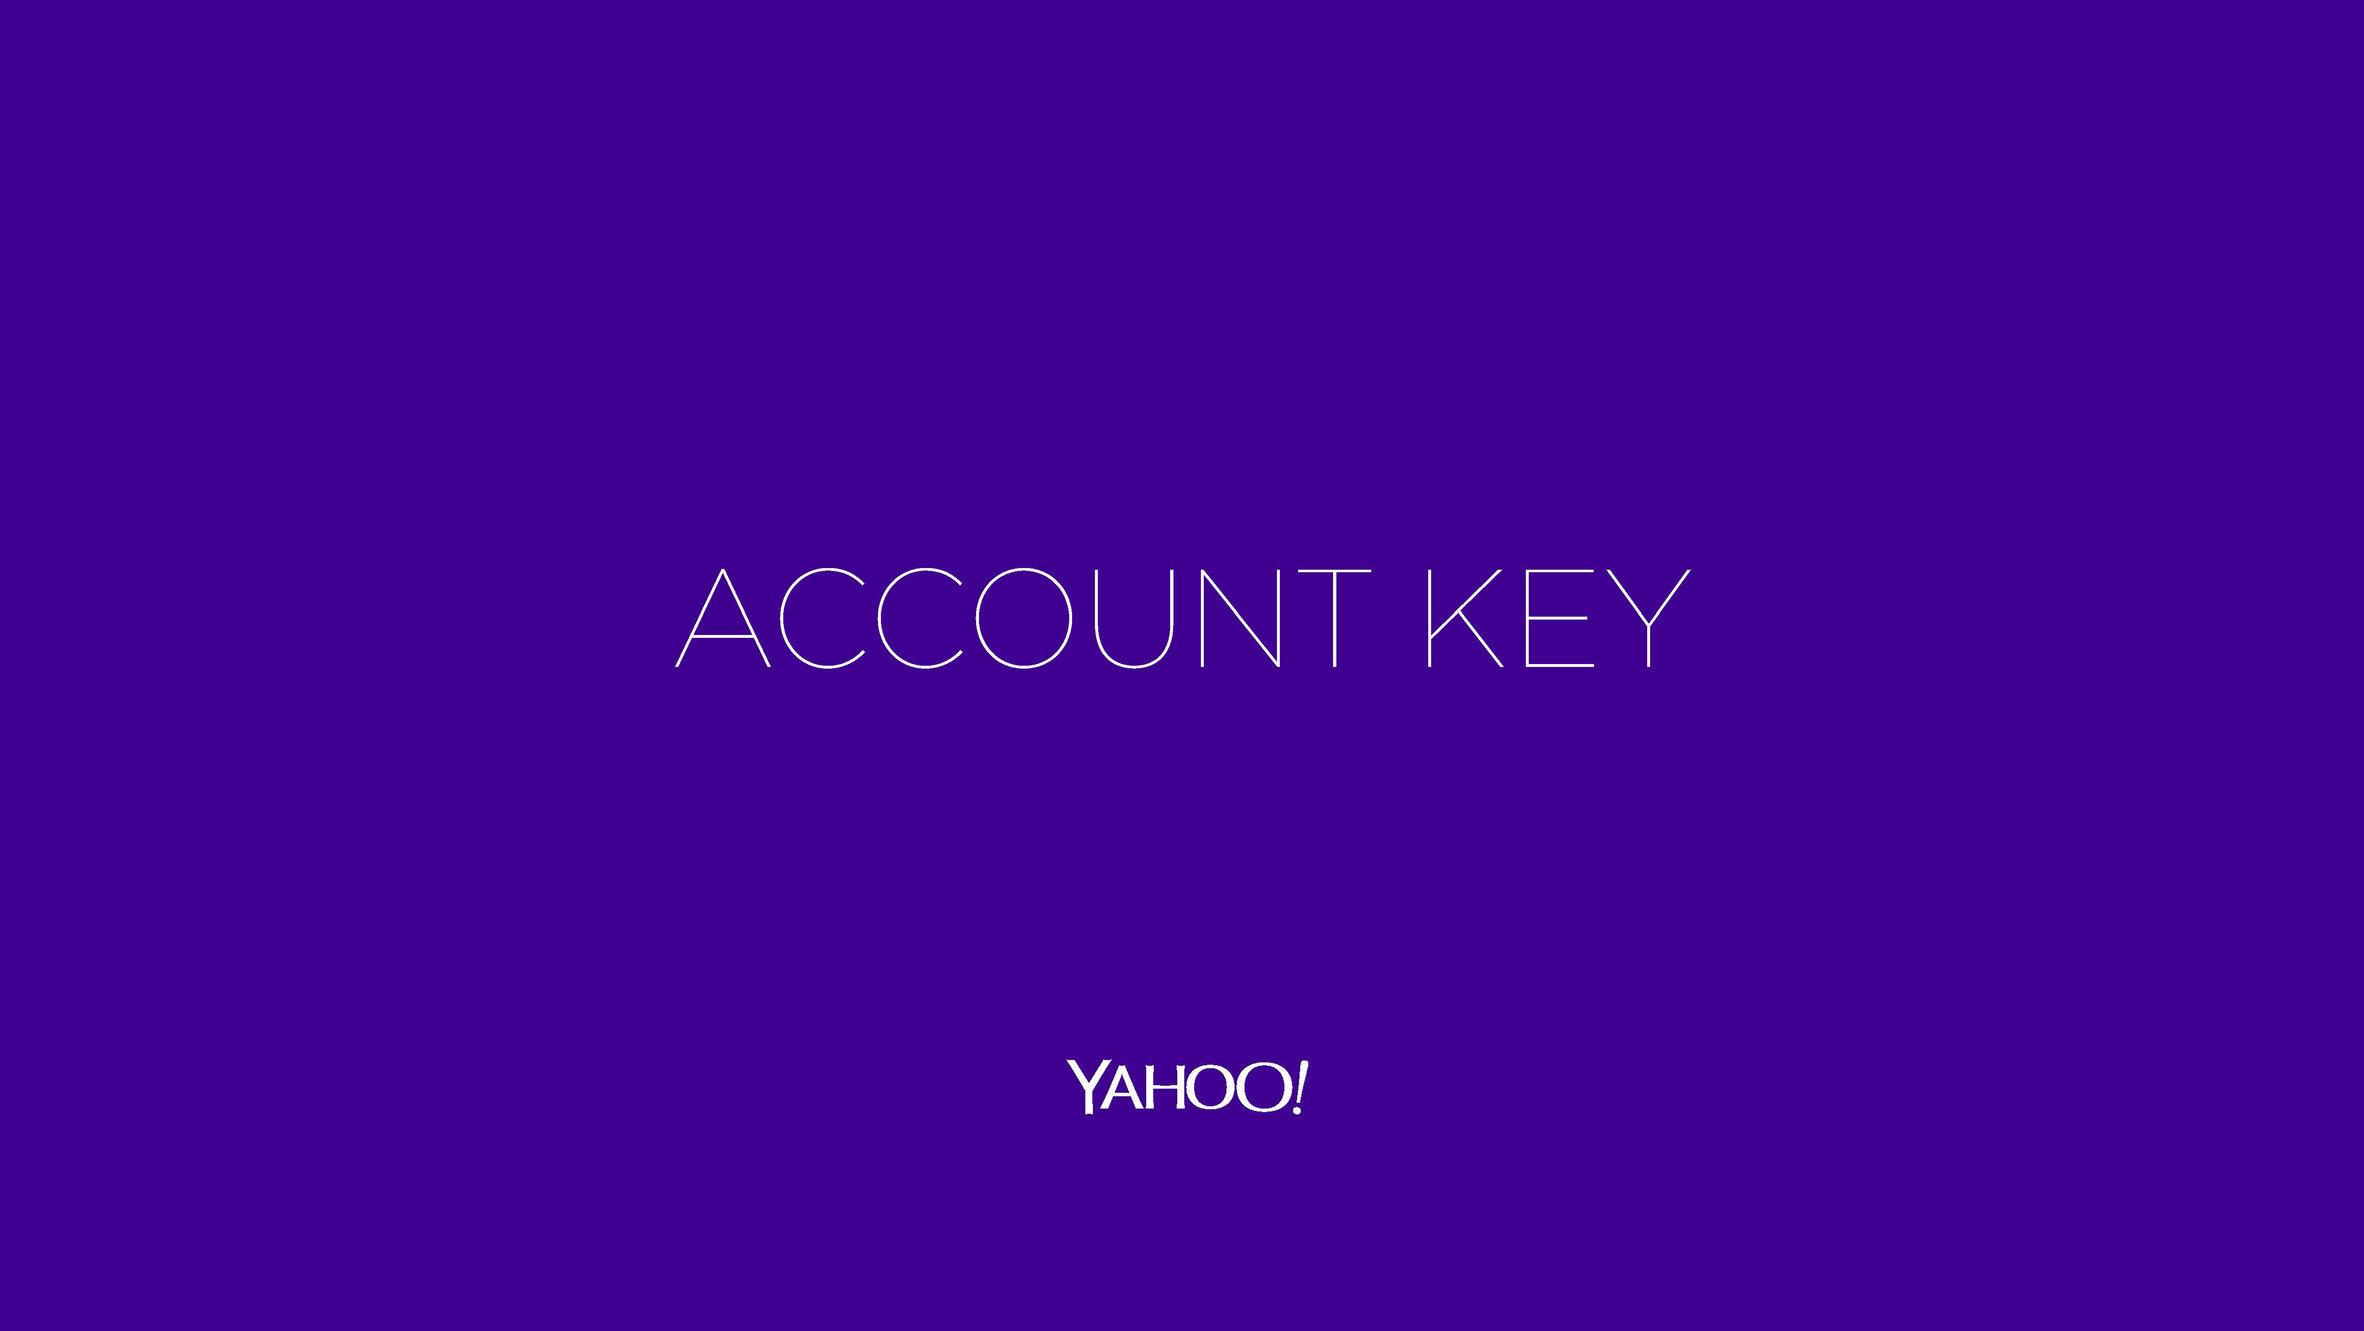 Yahoo! Account Key Campaign